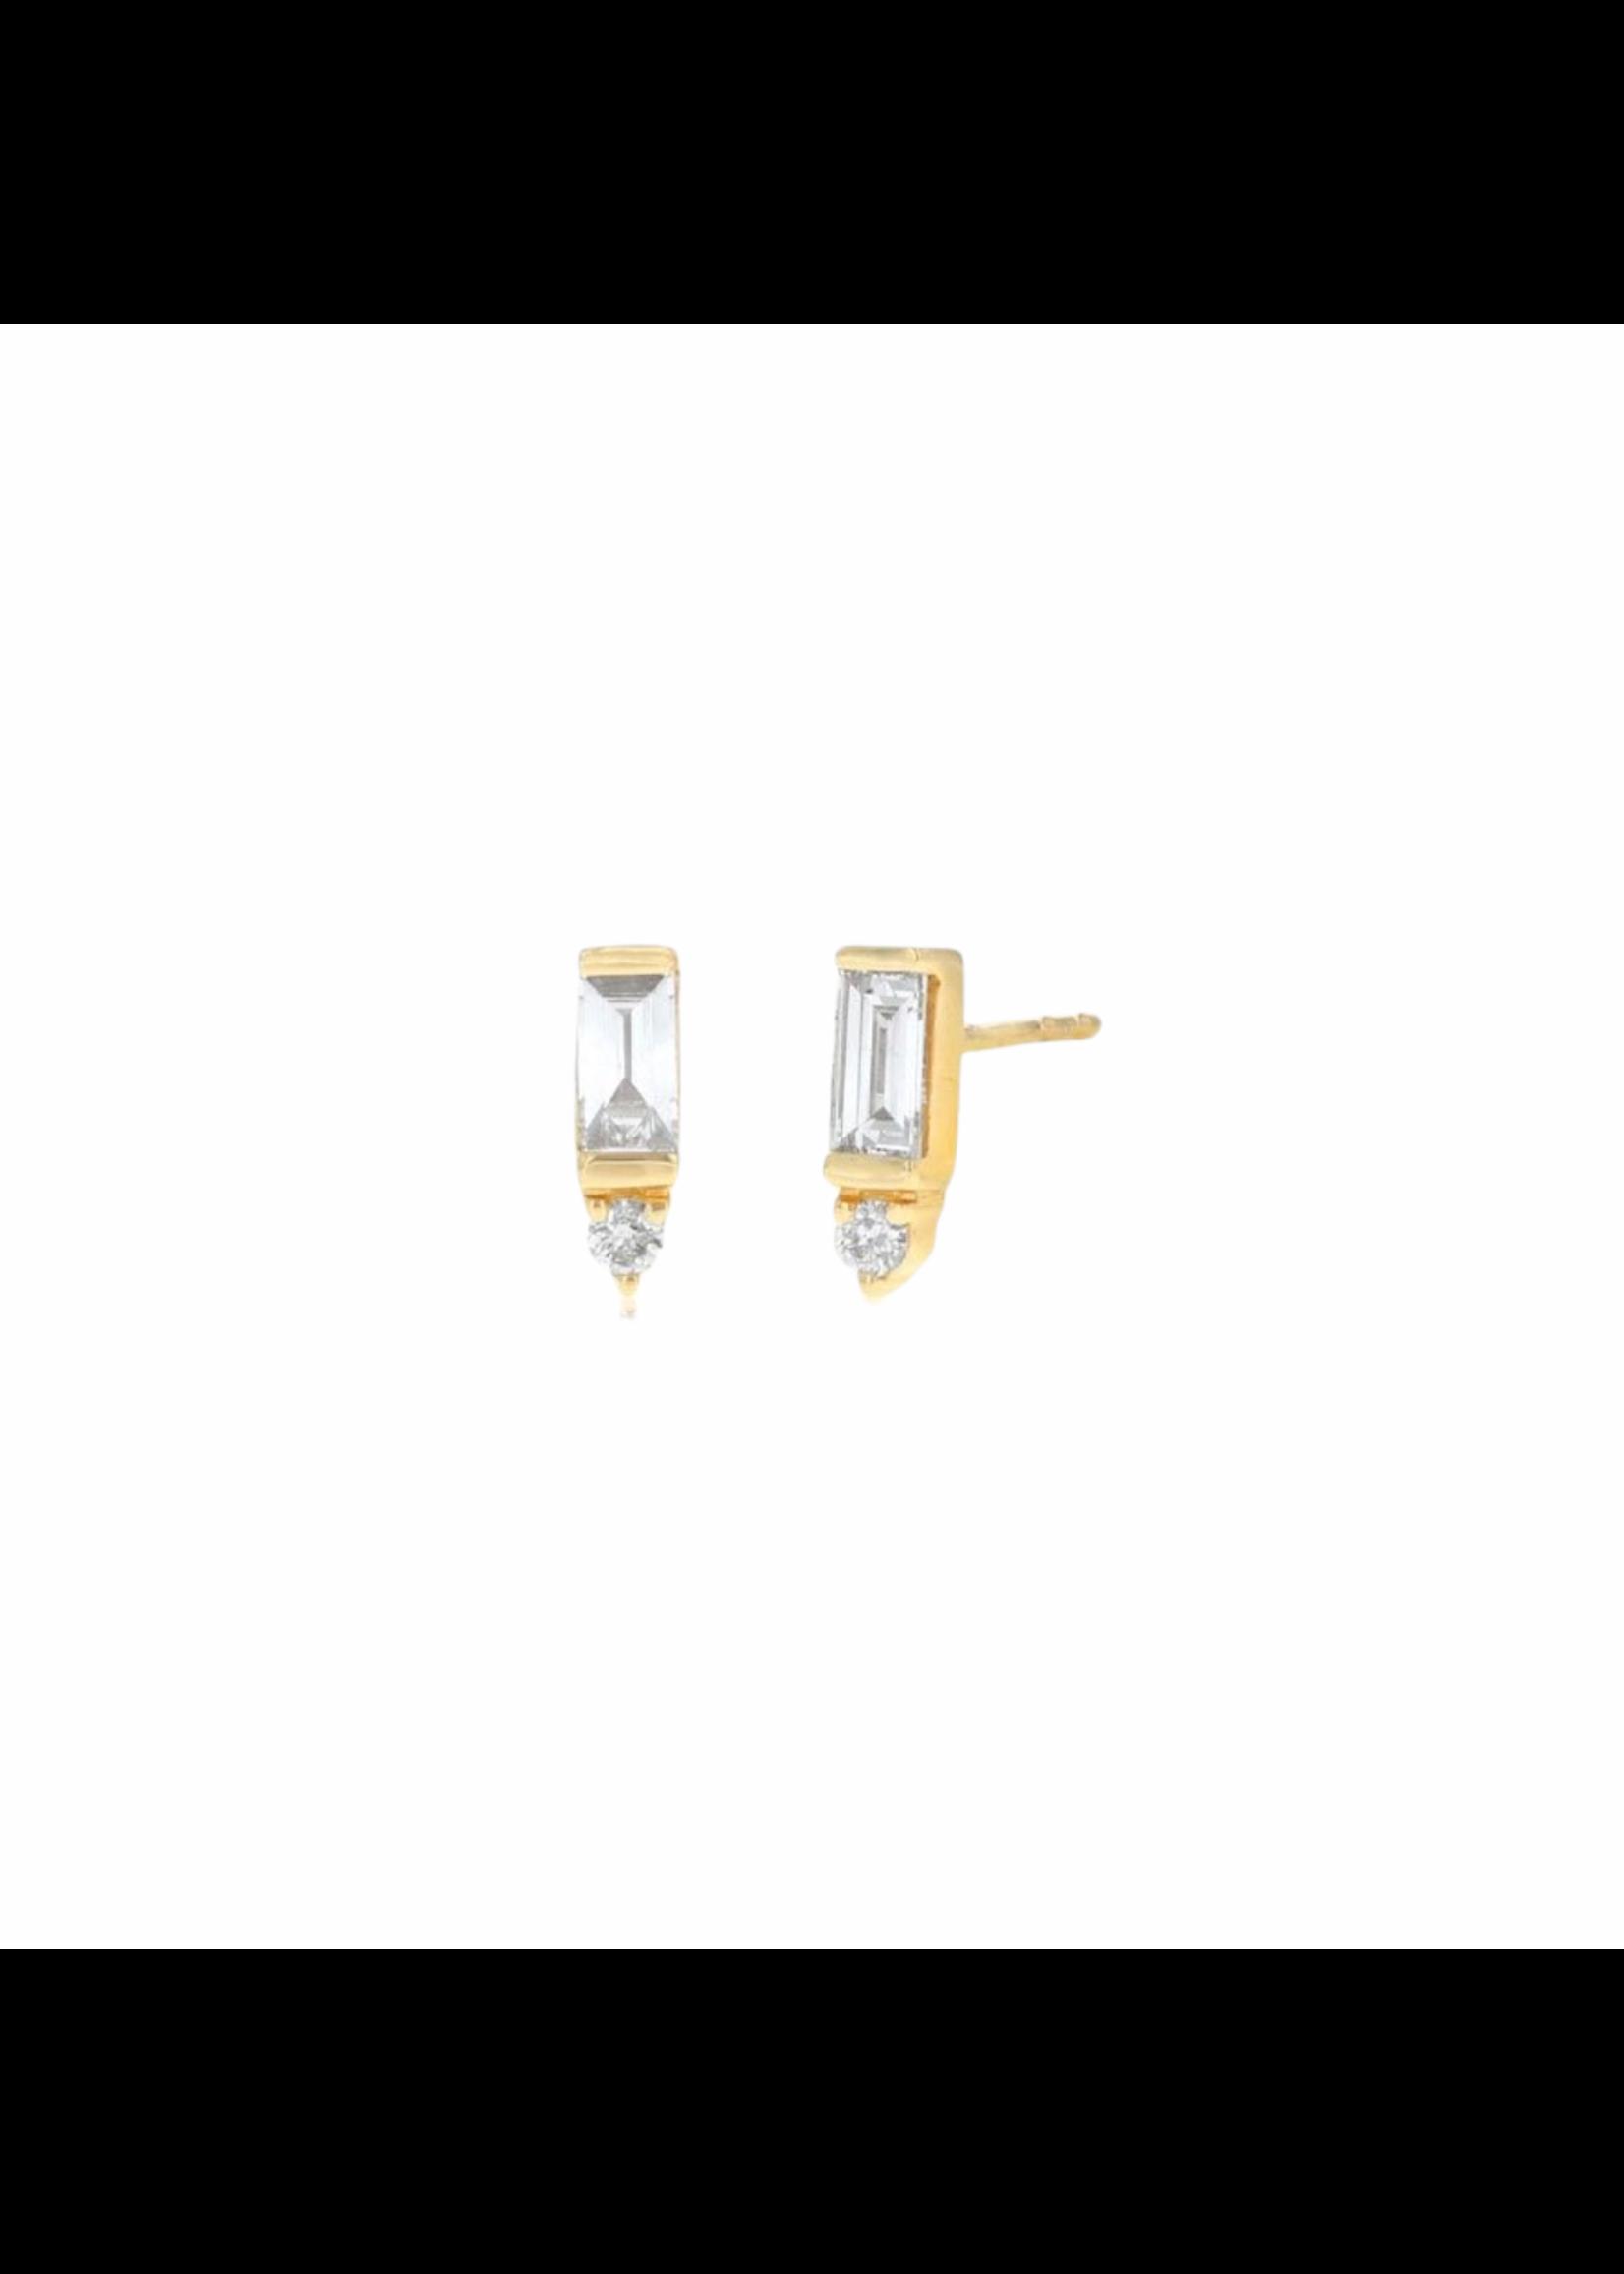 Rachel Reid Baguette & Round Diamond Stud Earrings